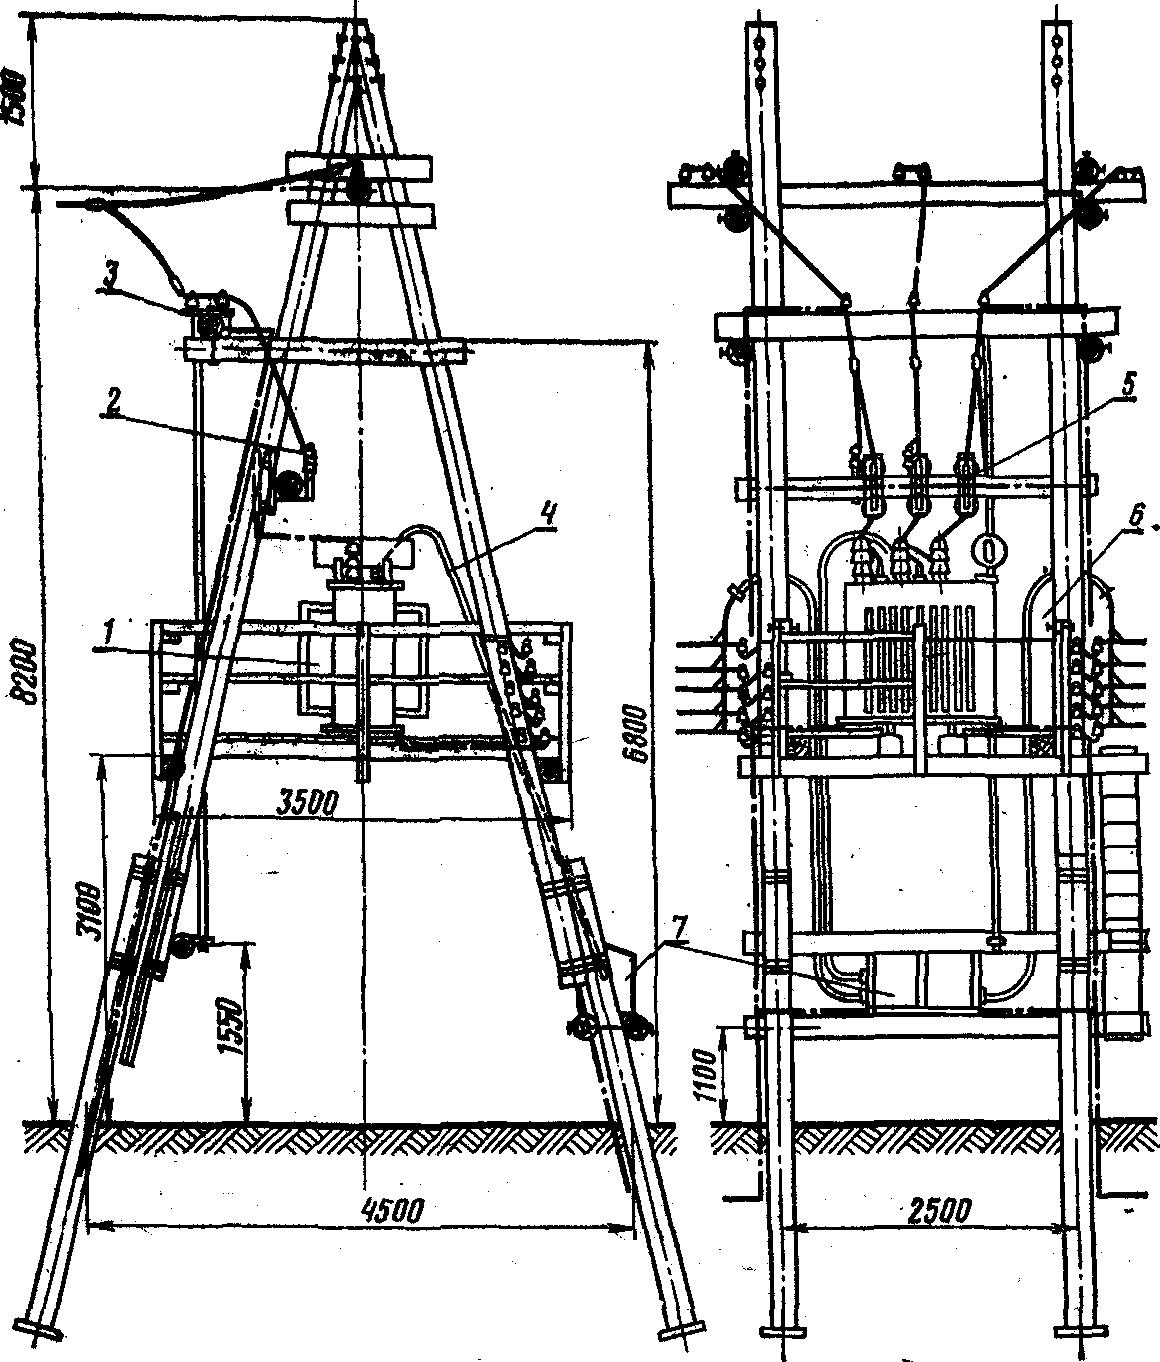 инструкция zoomlion 25v pdf